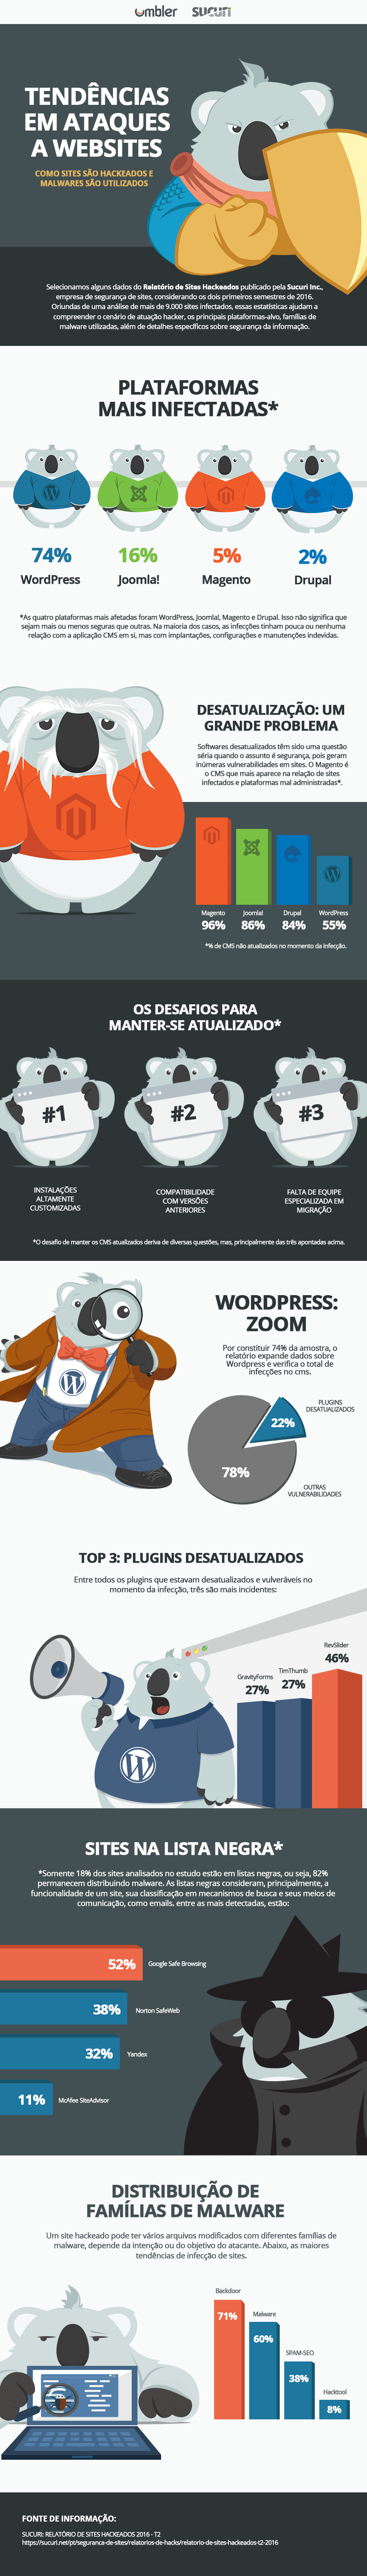 infografico-seguranca-de-sites